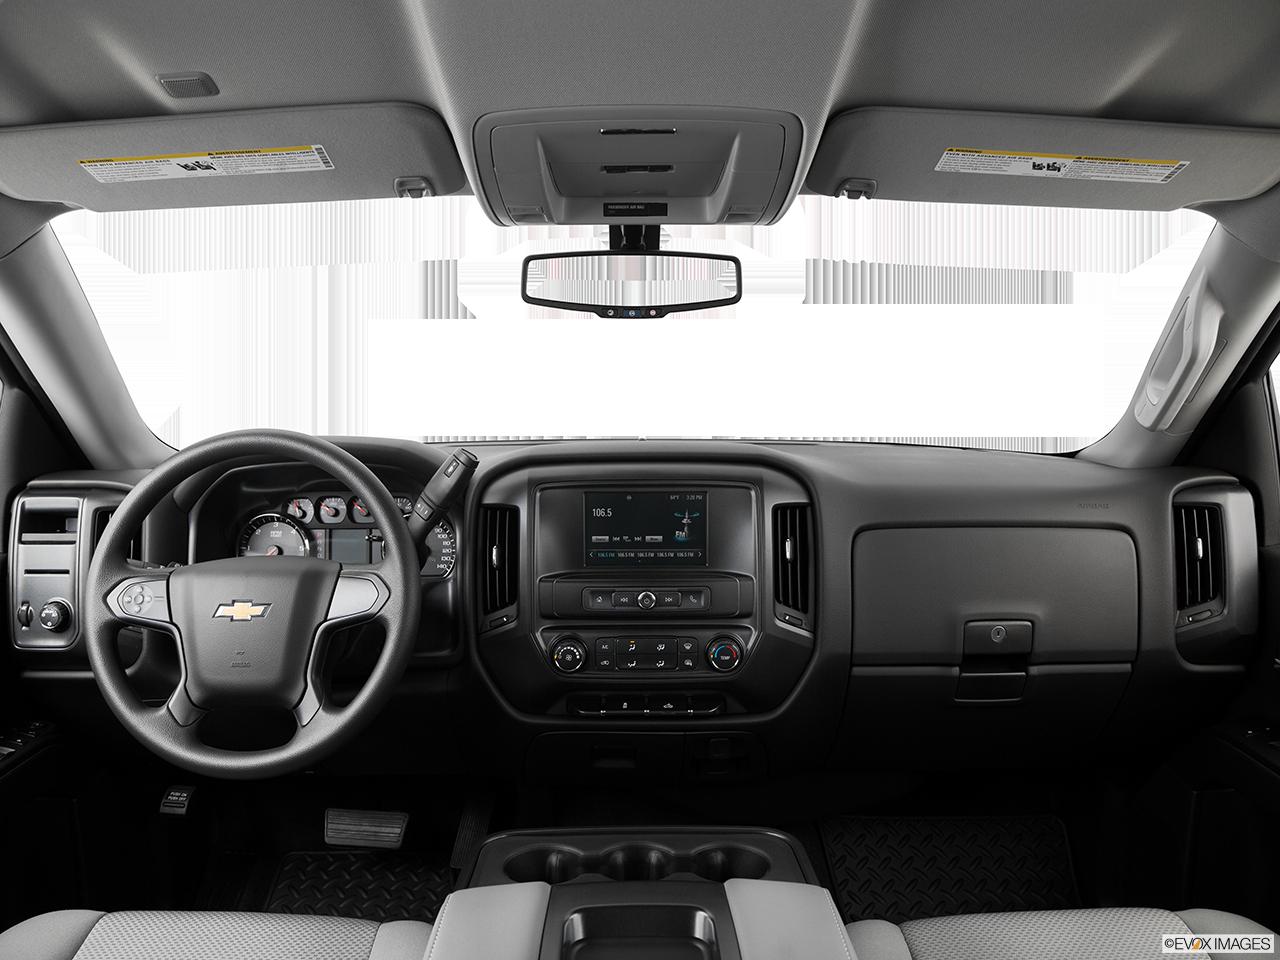 Marvelous Interior View Of 2016 Chevrolet Silverado 1500 In Houston